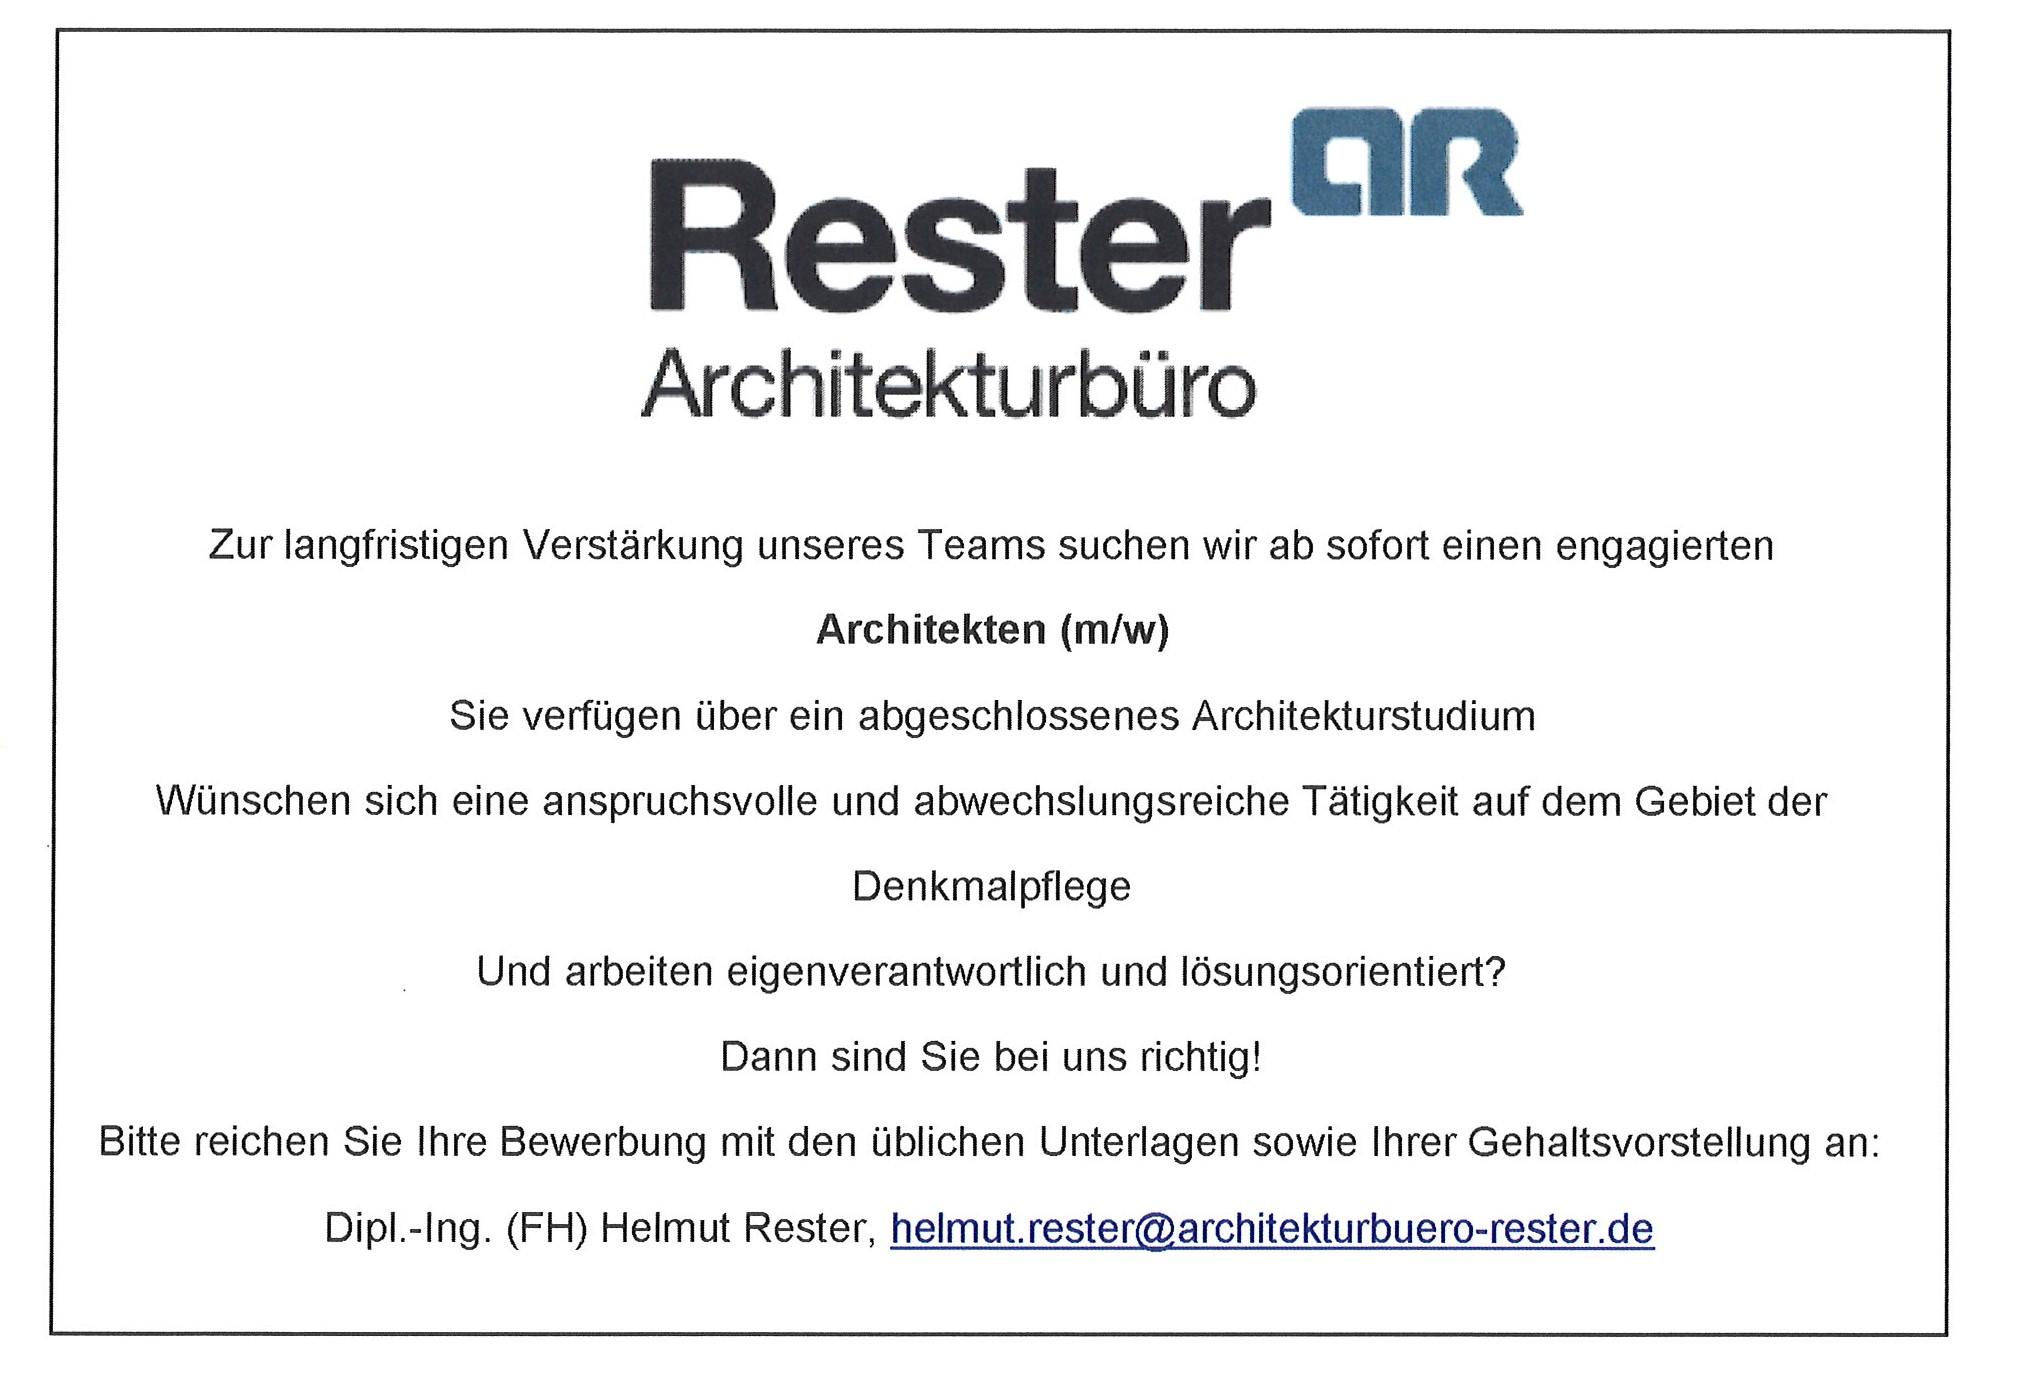 Architekturbuero-rester.de